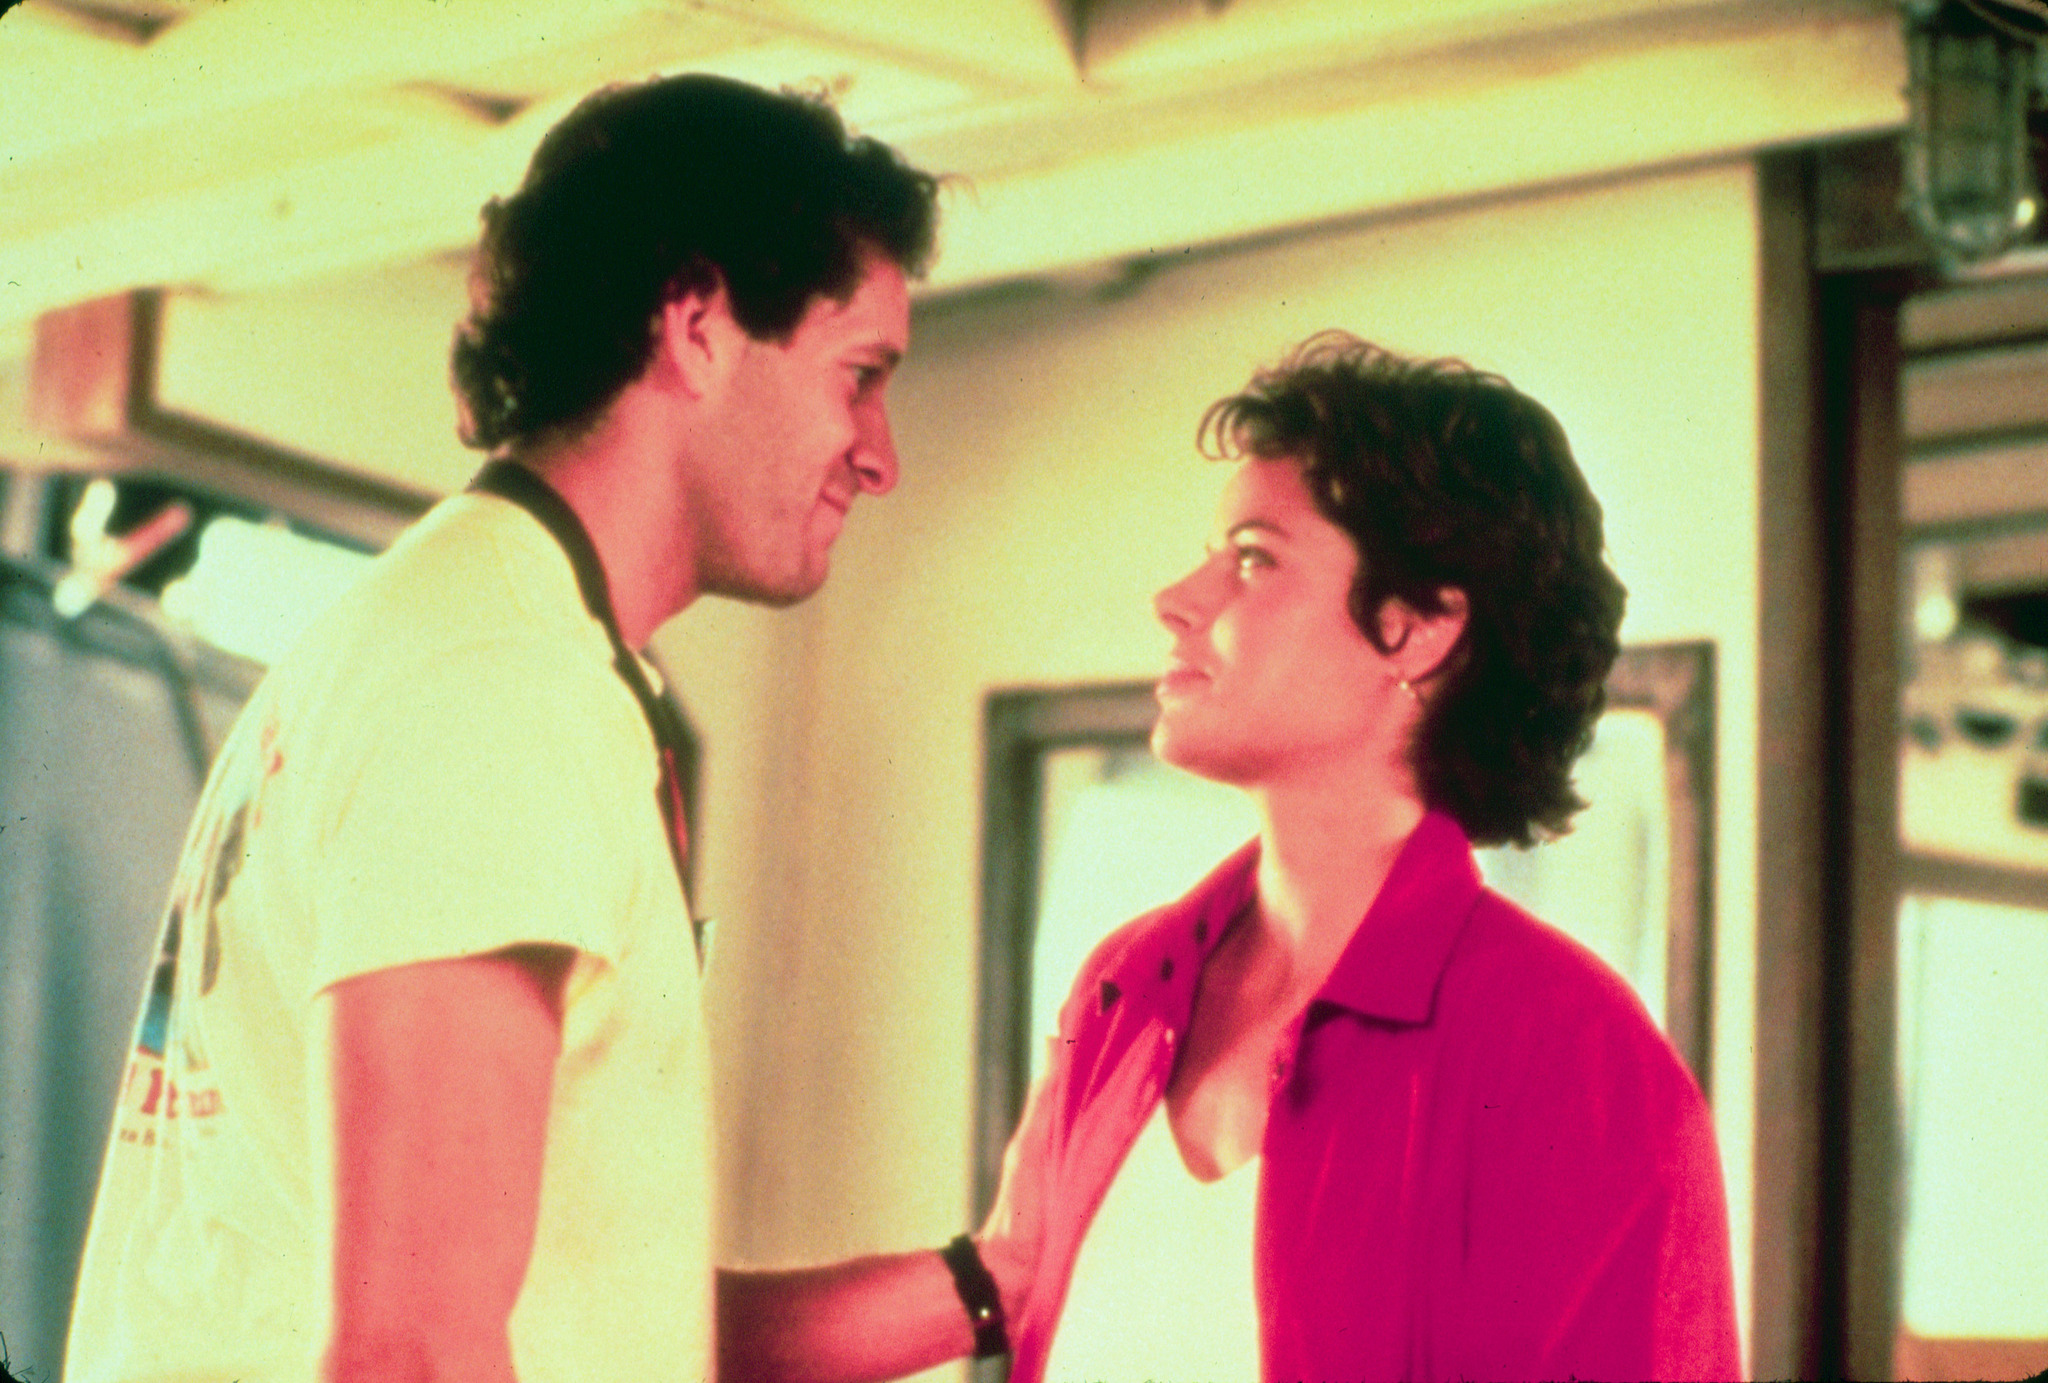 Steve Guttenberg and Tahnee Welch in Cocoon (1985)